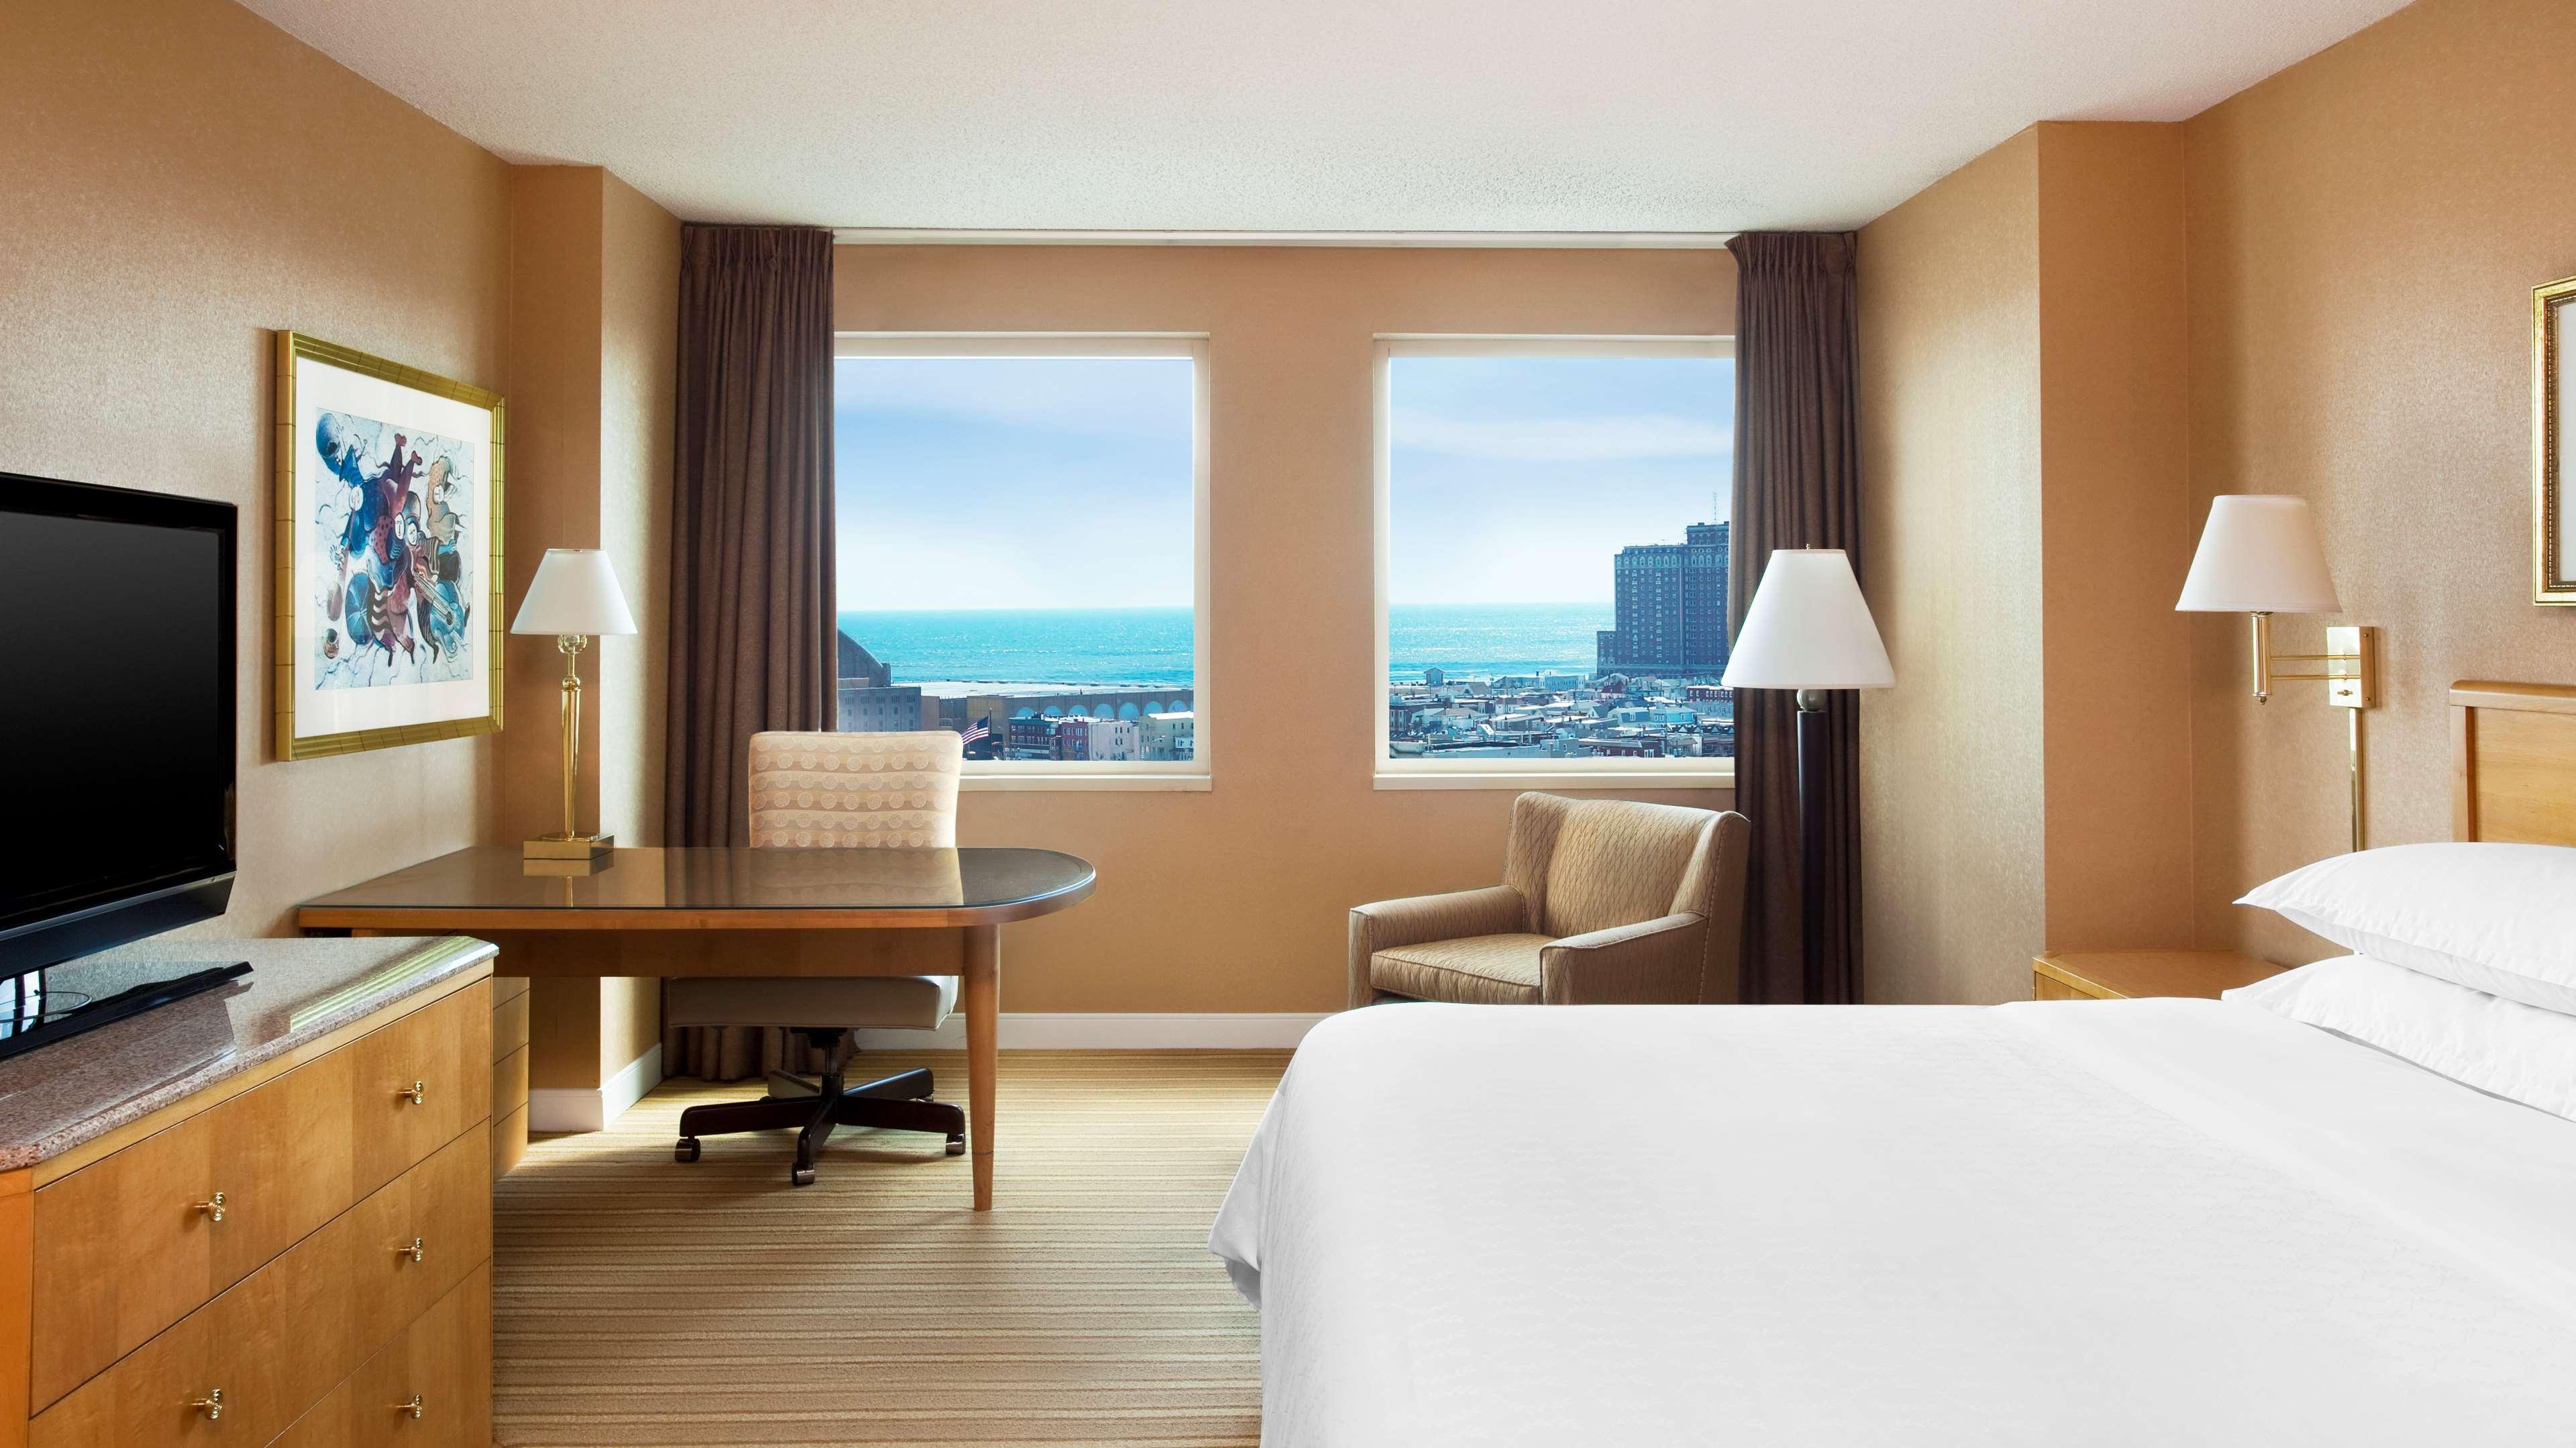 Sheraton Atlantic City Convention Center Hotel image 9